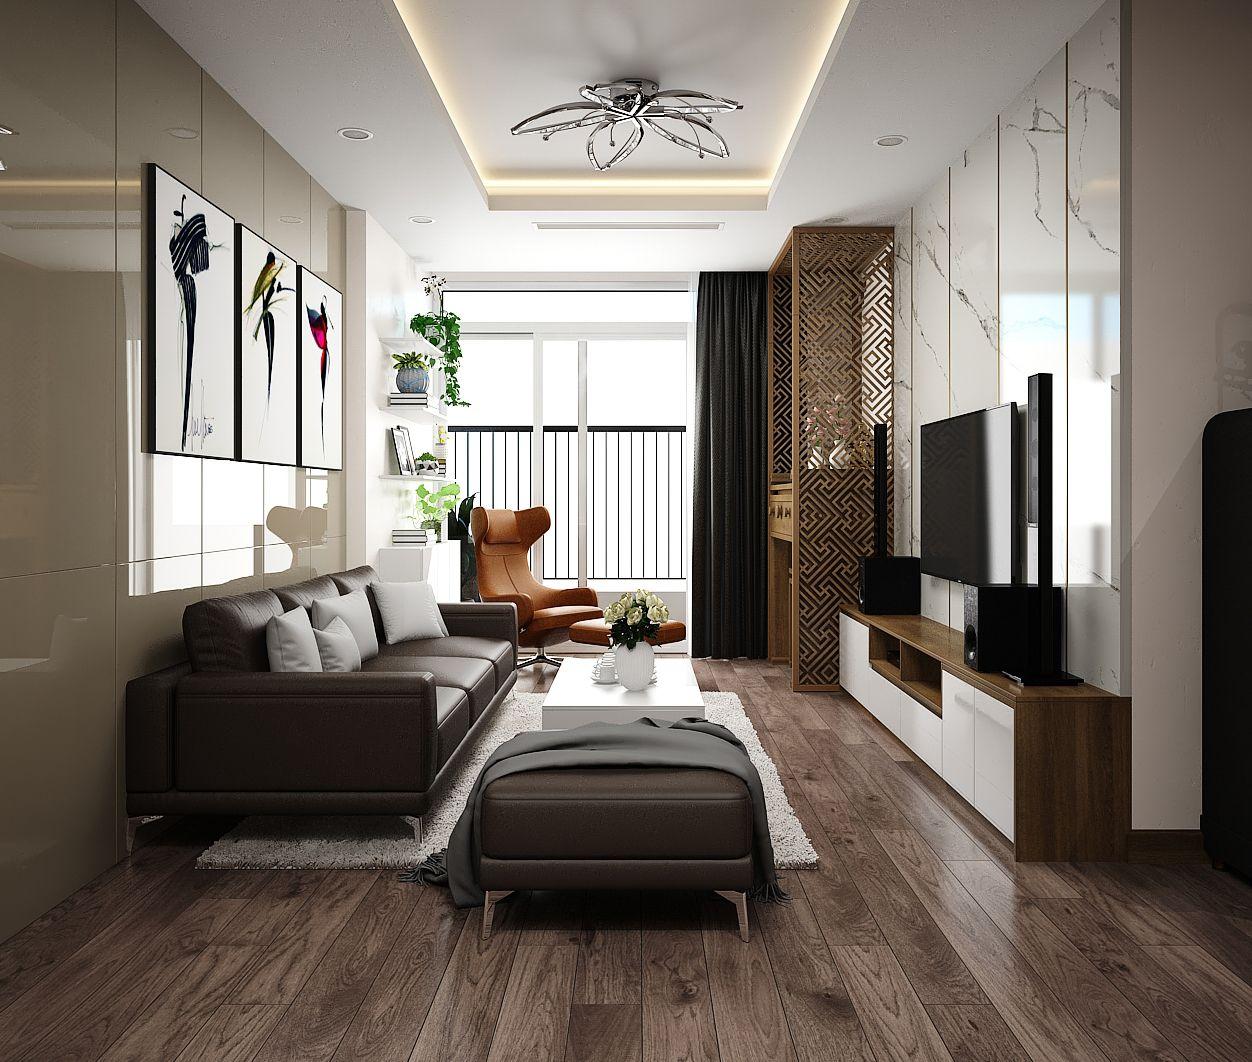 thiết kế nội thất 4